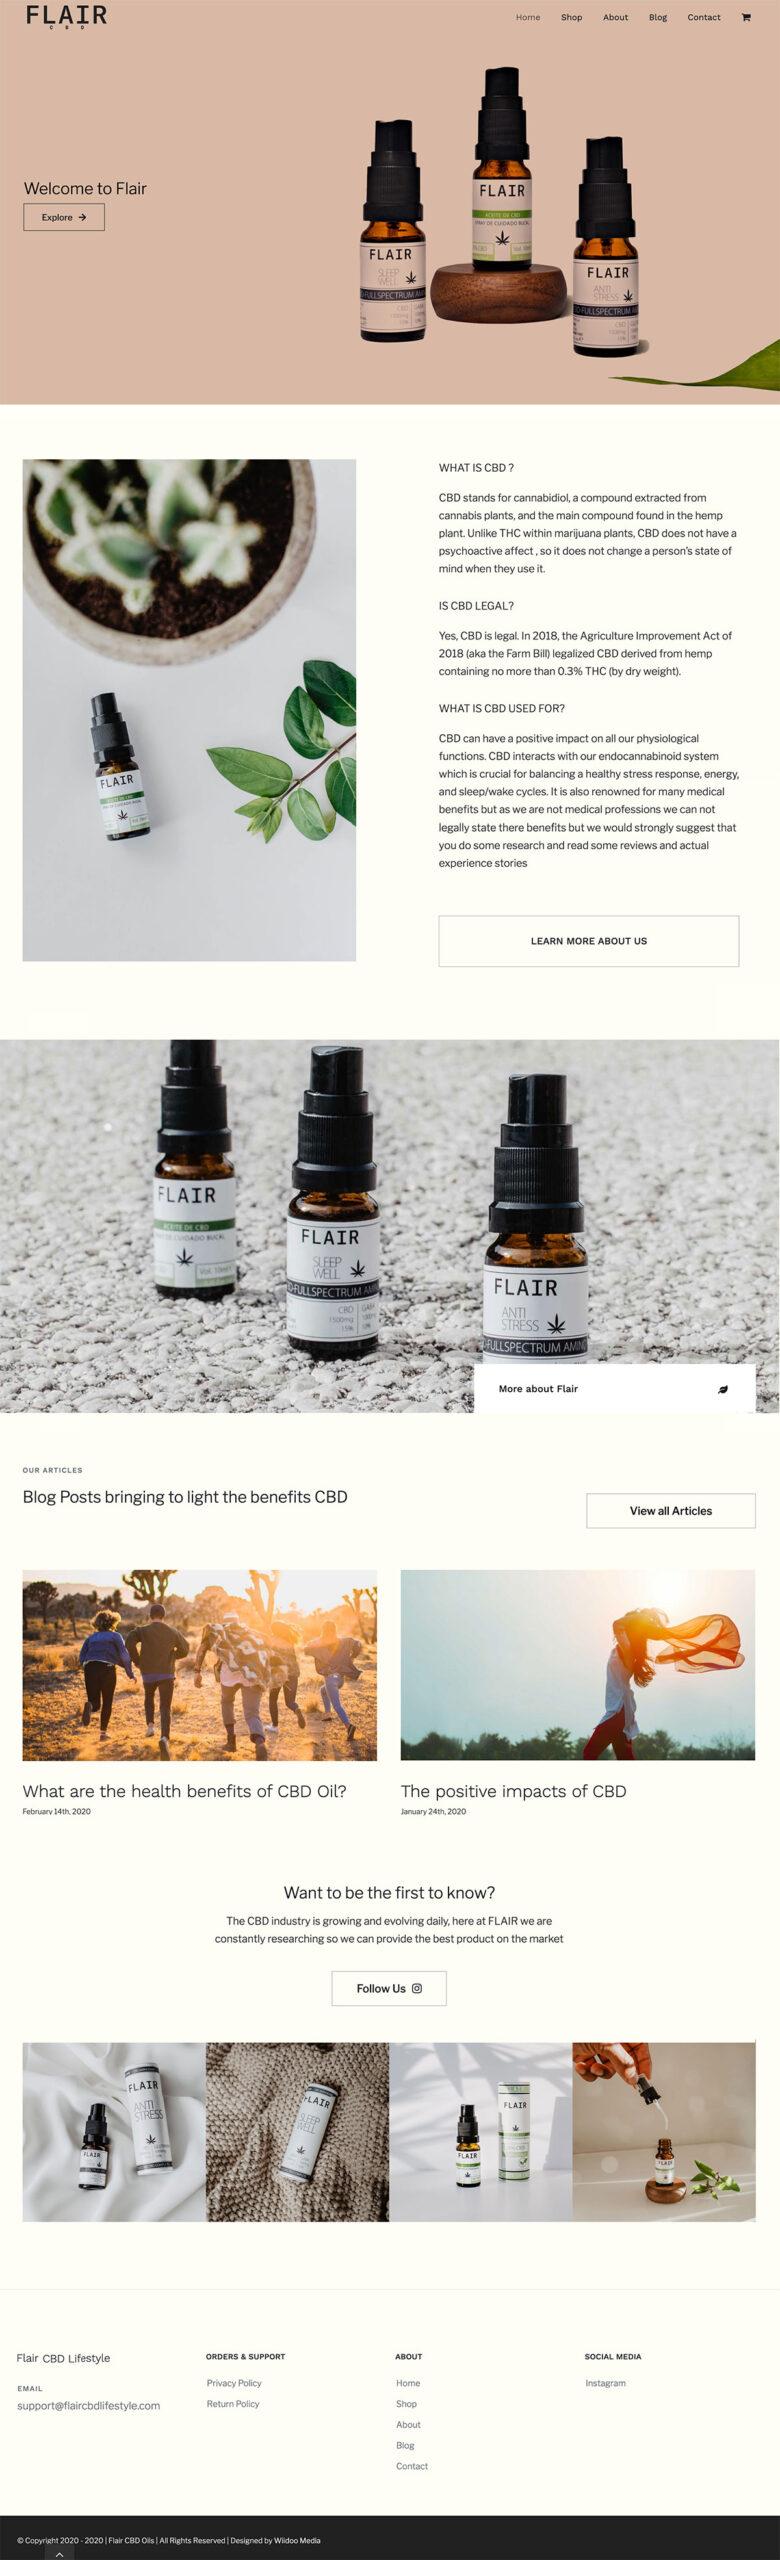 flair cbd lifestyle wordpress website design cbd oils wiidoo media marbella